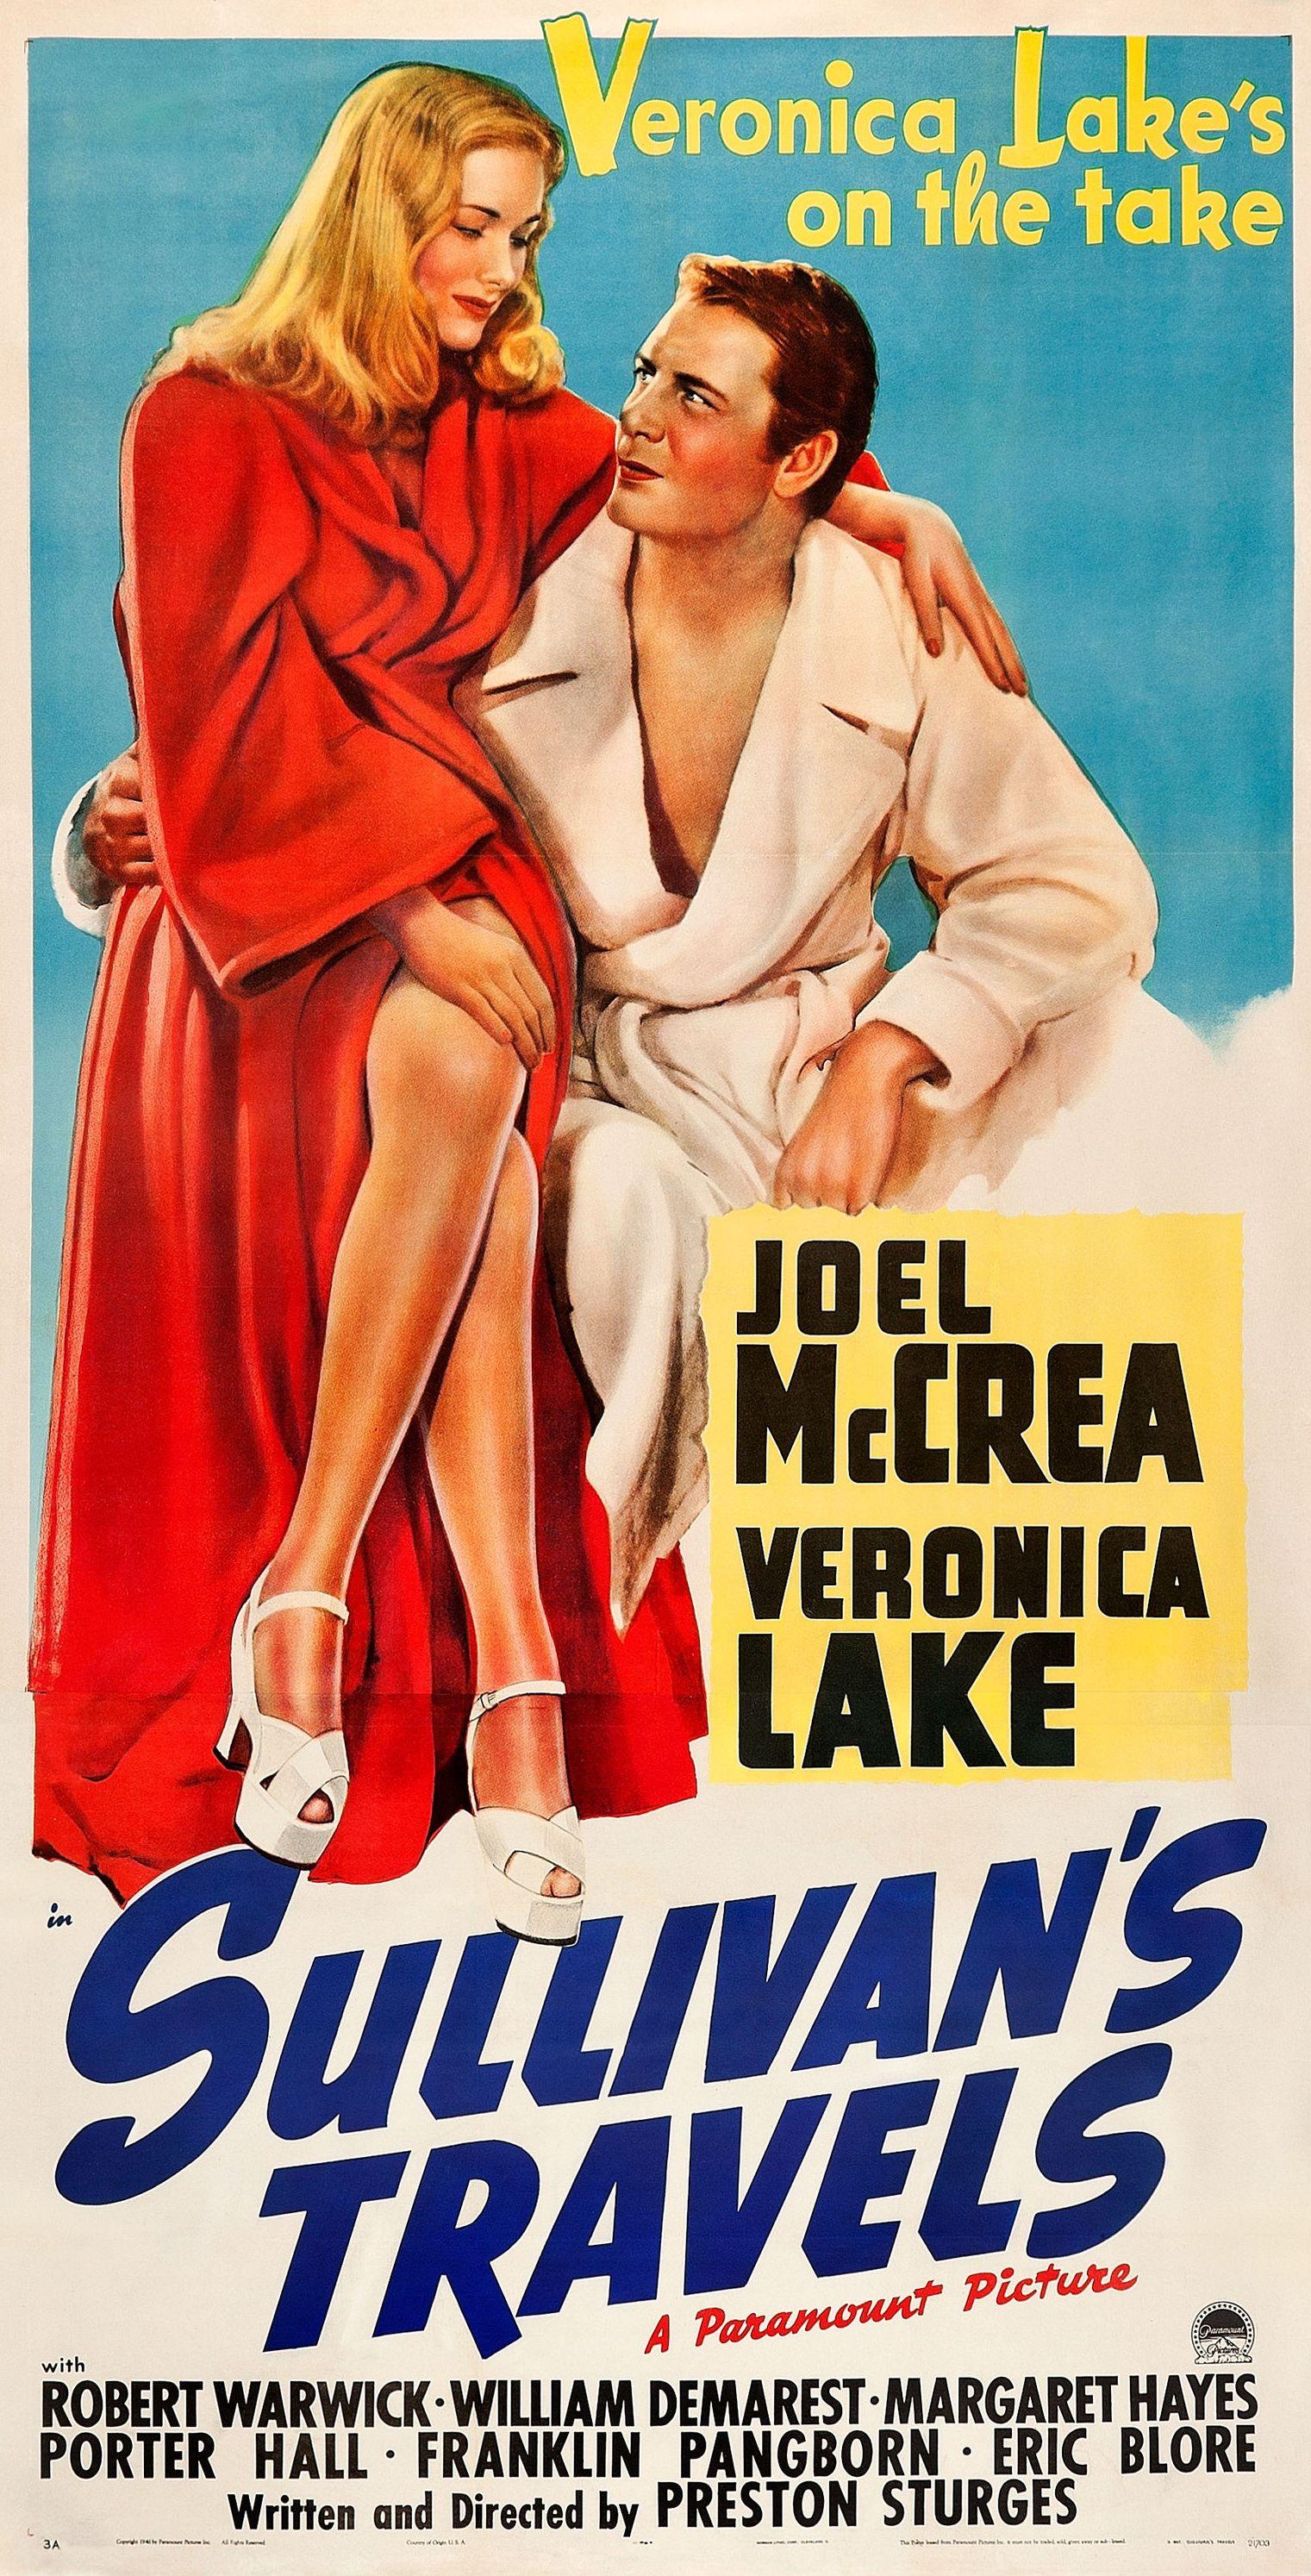 ❤️ Februar 2016* | Preston Sturges | Sullivan's Travels | USA (1941) | 041  1001-film | 003 Film Noir | 001… | Veronica lake, Old film posters, Classic  movie posters